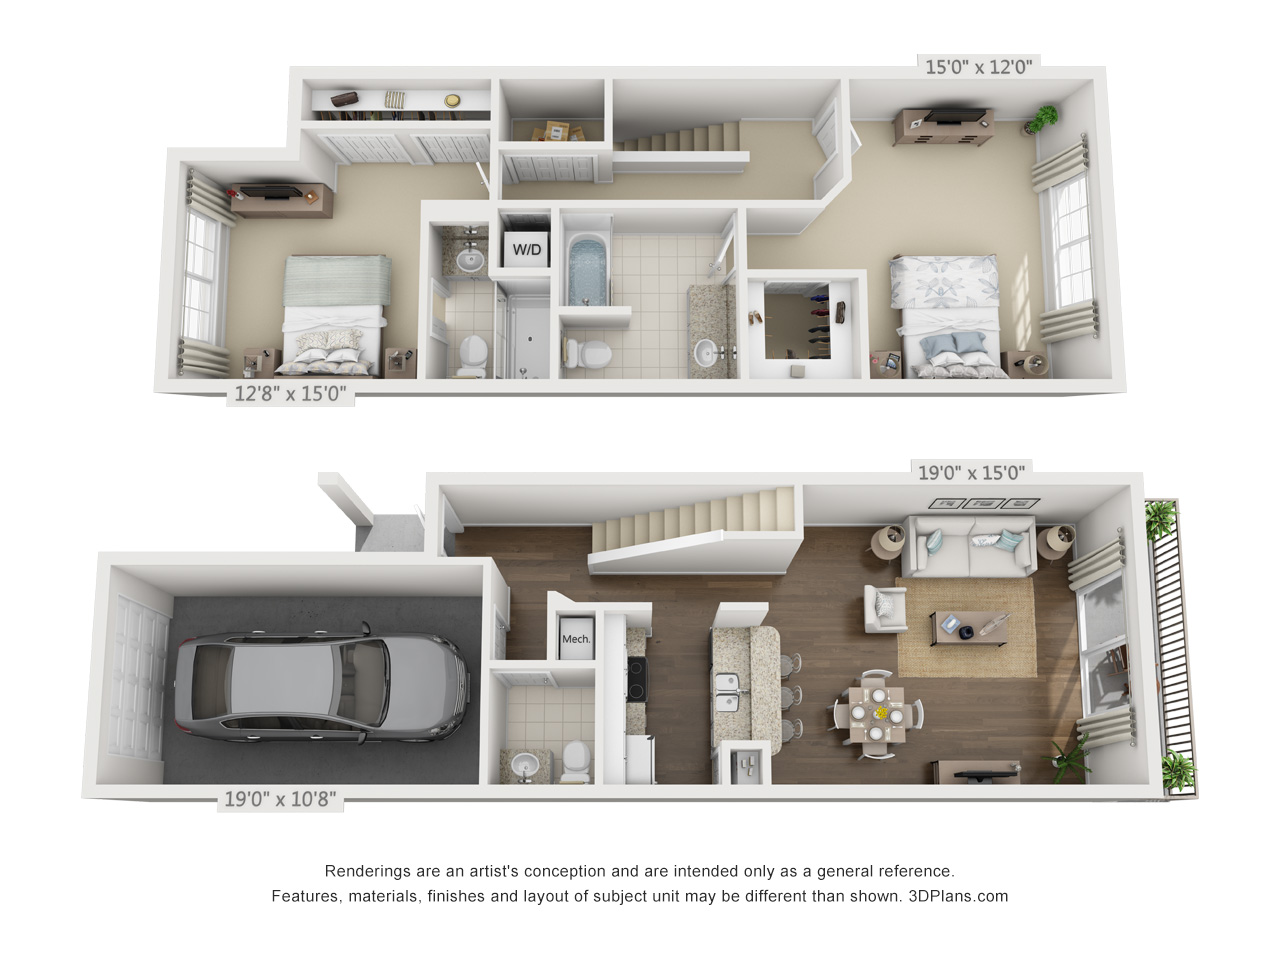 3 bedroom apartment in pembroke pines